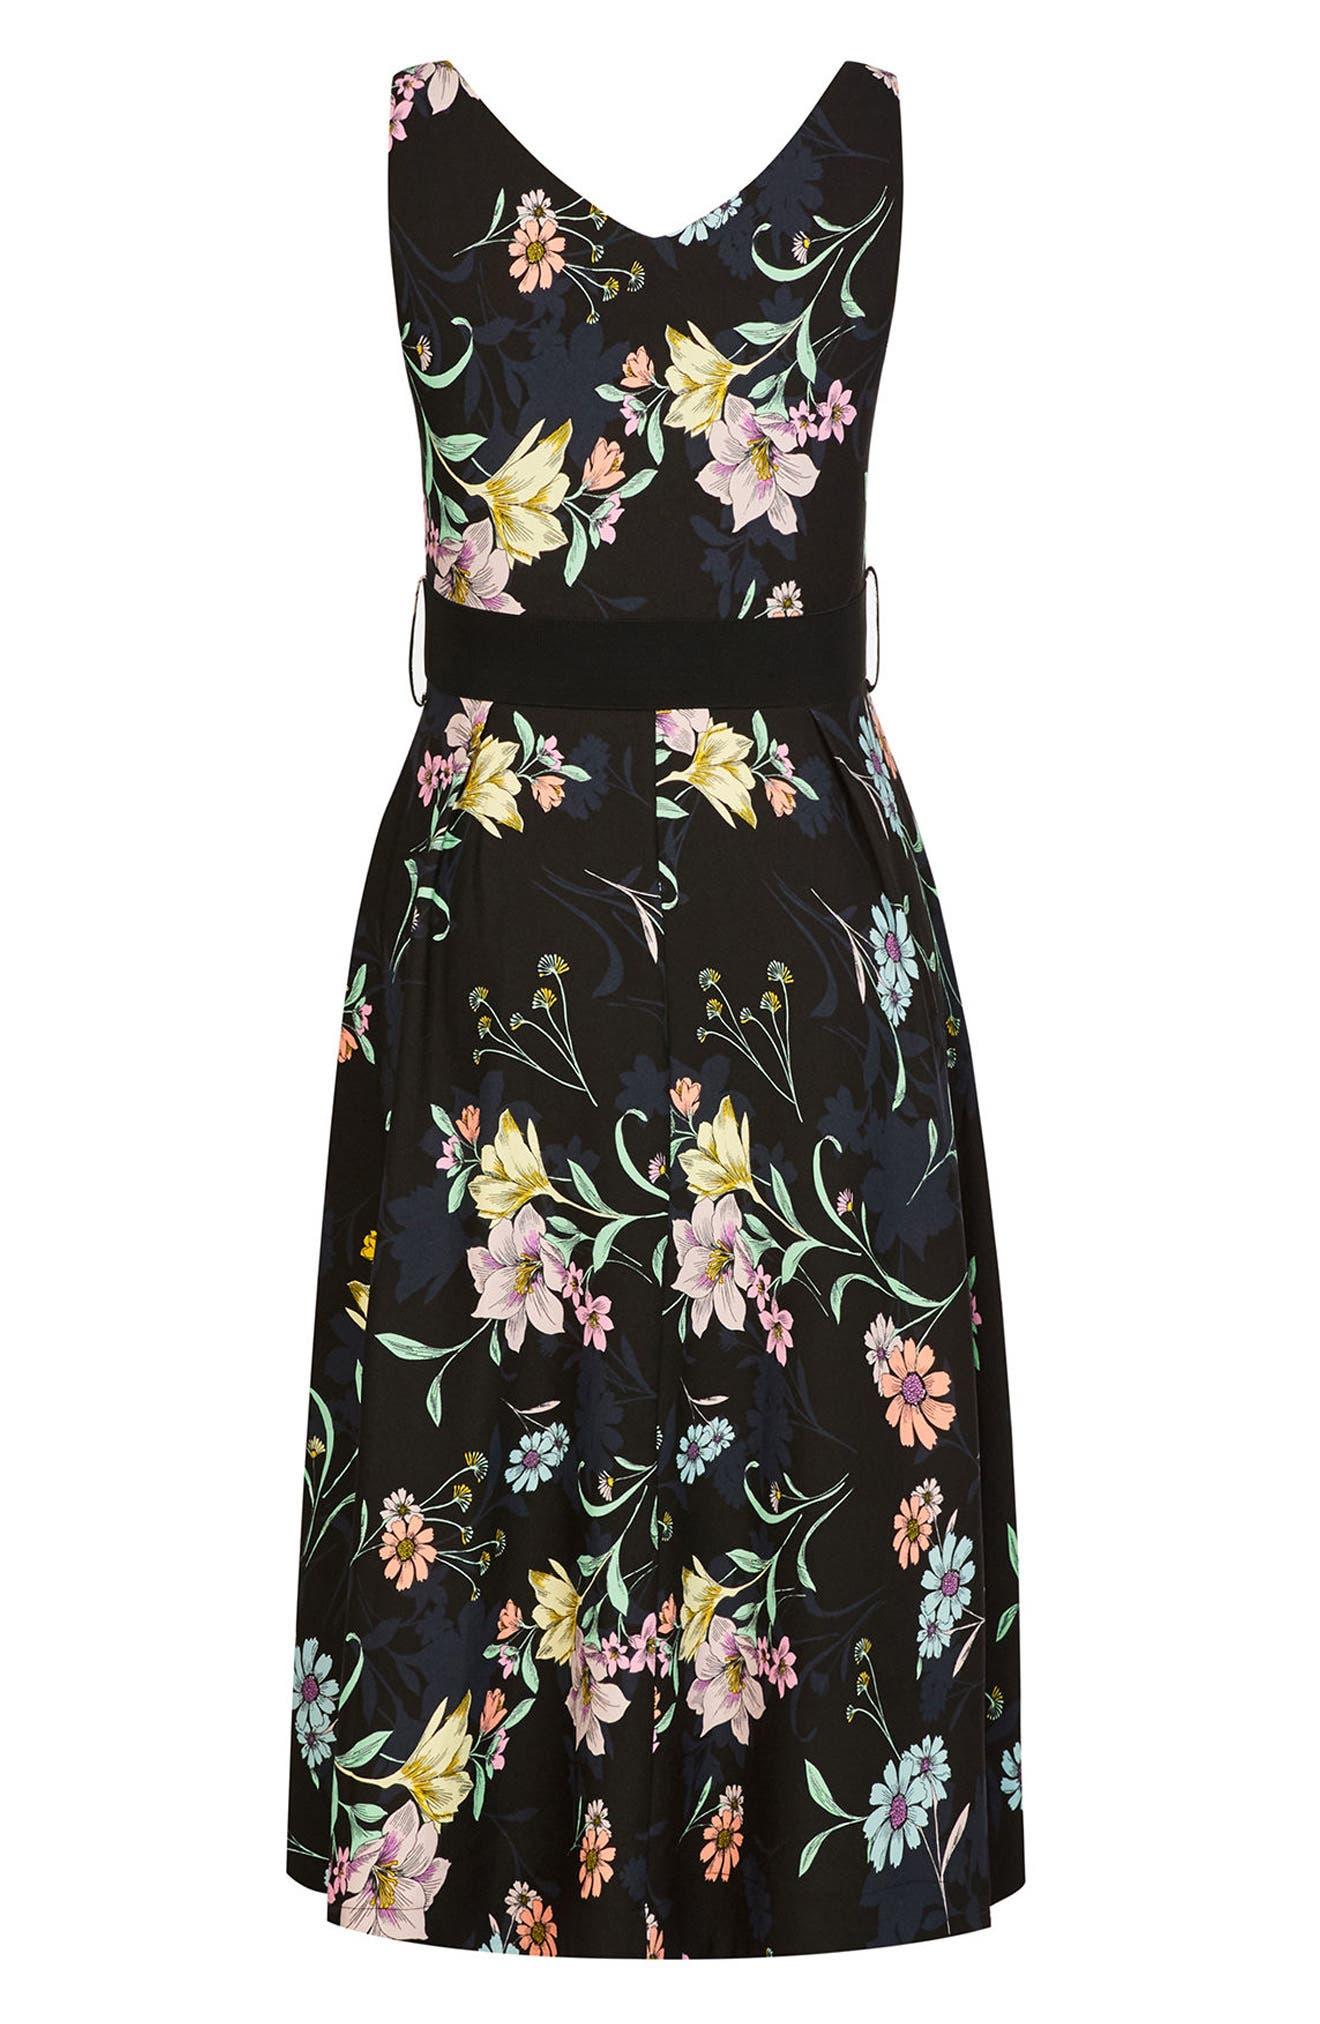 Sketch Love Floral A-Line Midi Dress,                             Alternate thumbnail 3, color,                             Black